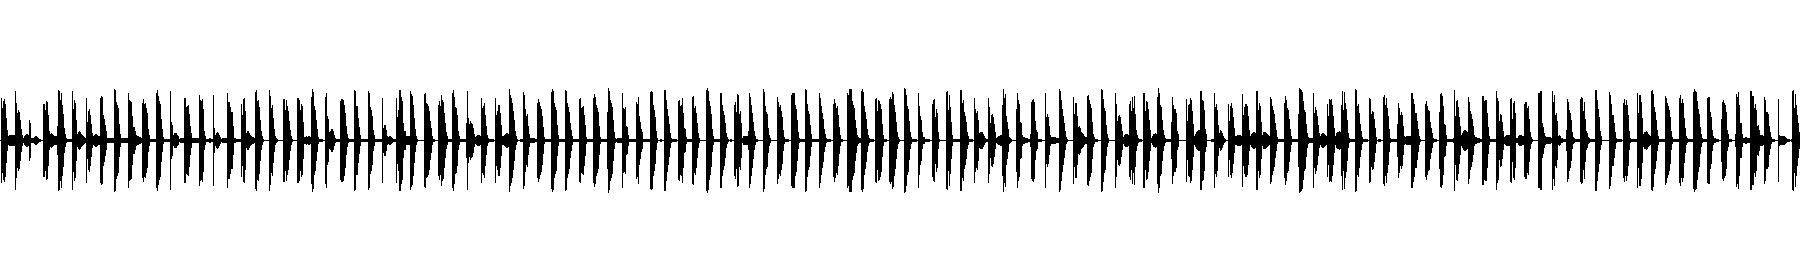 sh 1013